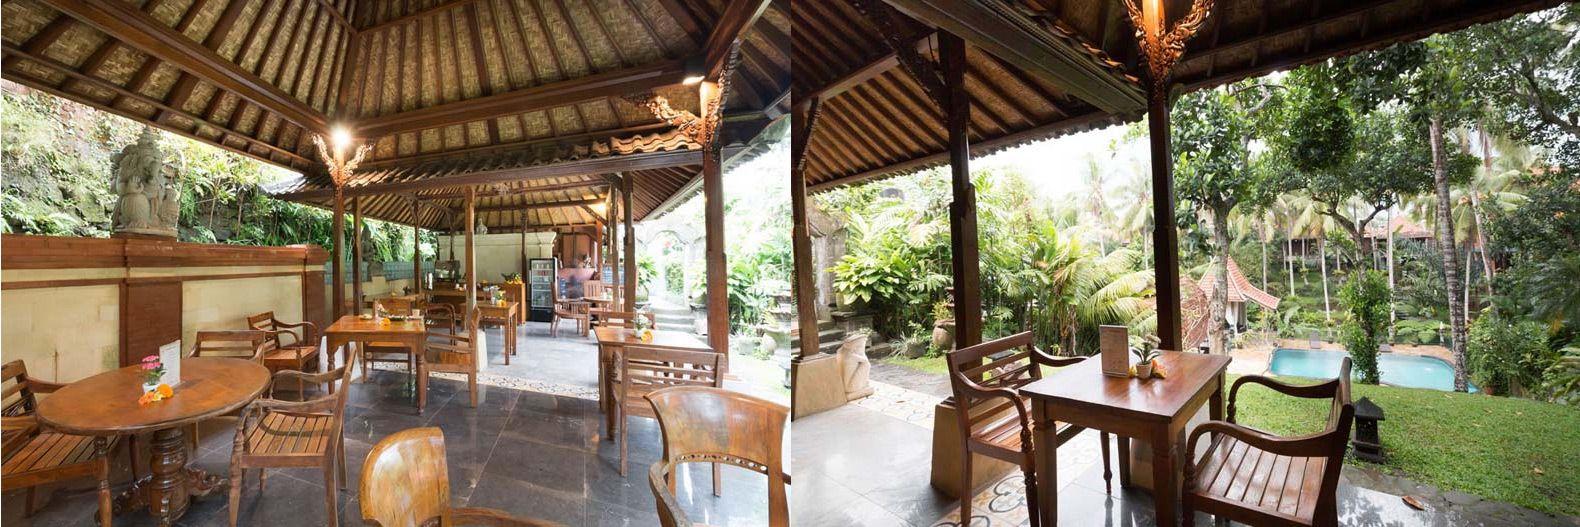 narasoma tea house